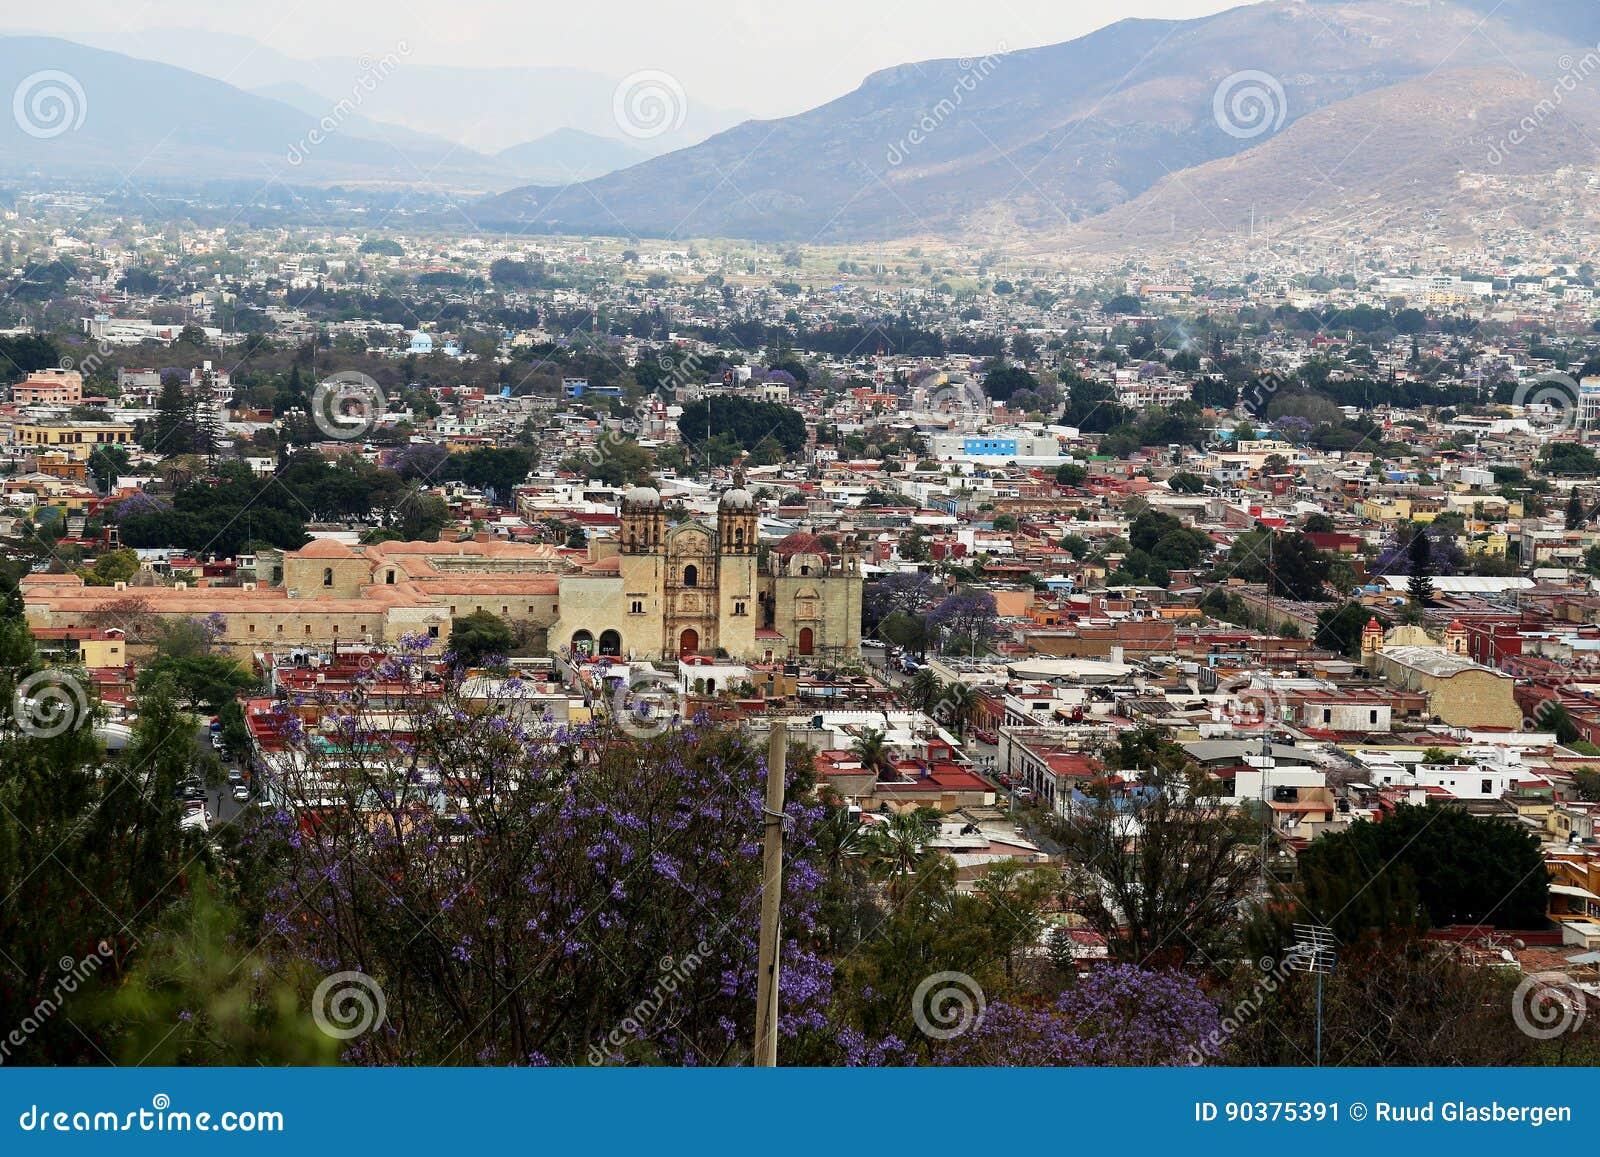 Looking over Oaxaca city, Mexico.